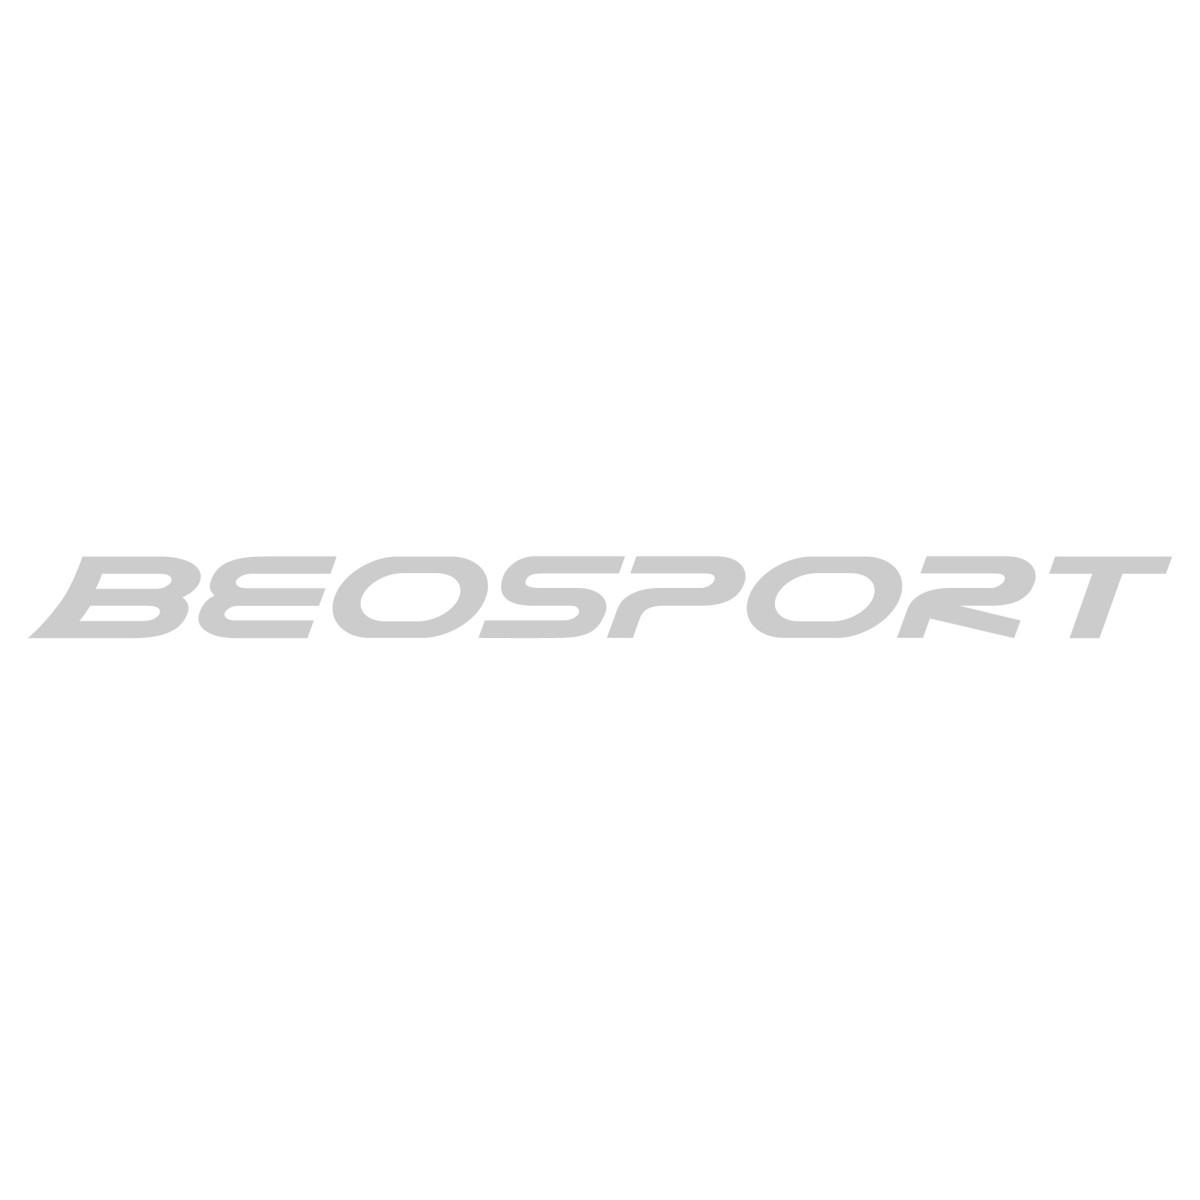 Wilson Pwr Smls 12.5 suknja